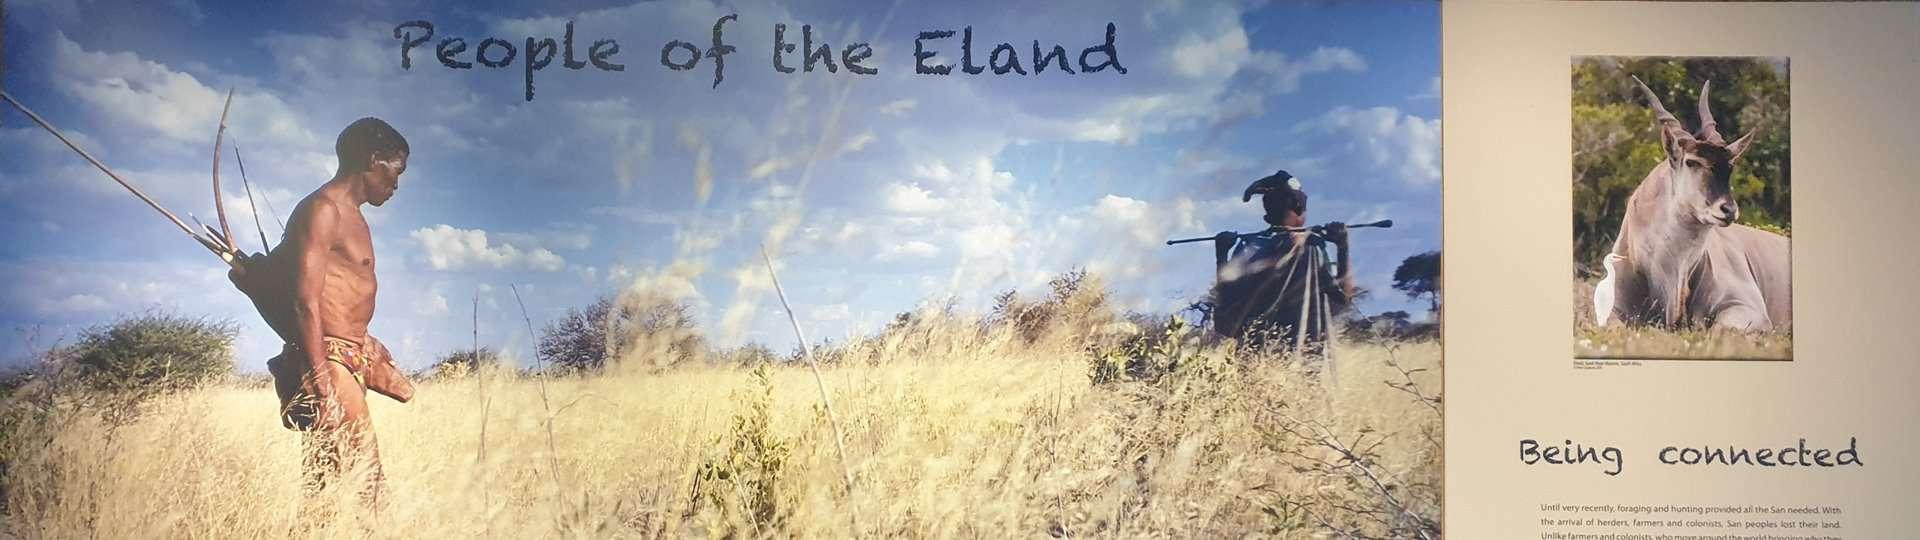 People of the Eland display at !Khwa-ttu.